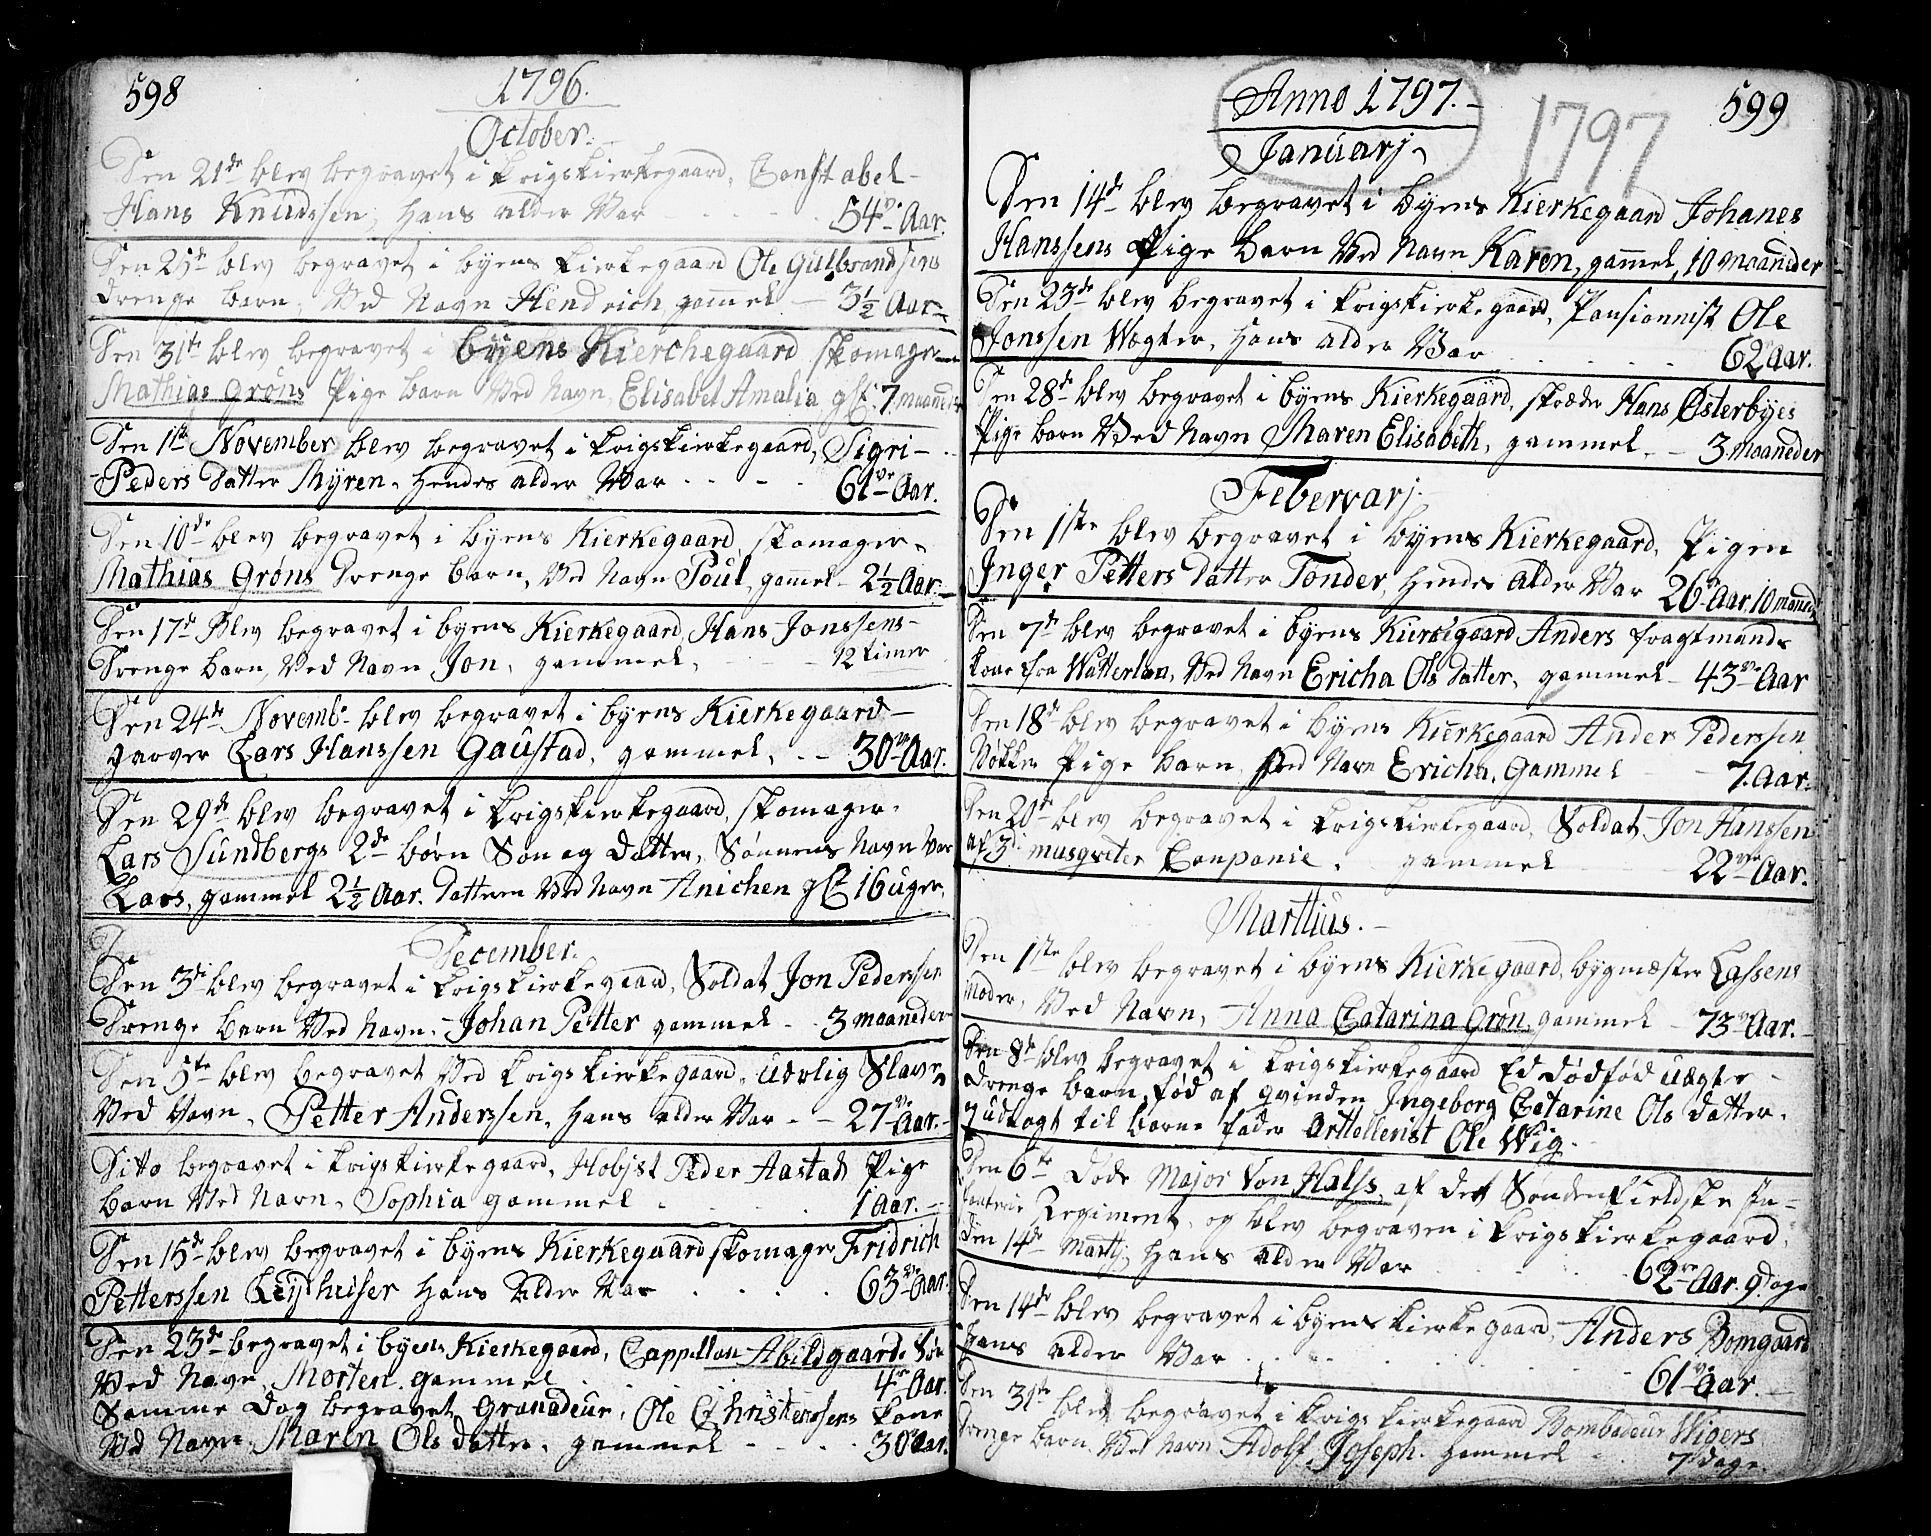 SAO, Fredrikstad prestekontor Kirkebøker, F/Fa/L0002: Ministerialbok nr. 2, 1750-1804, s. 598-599